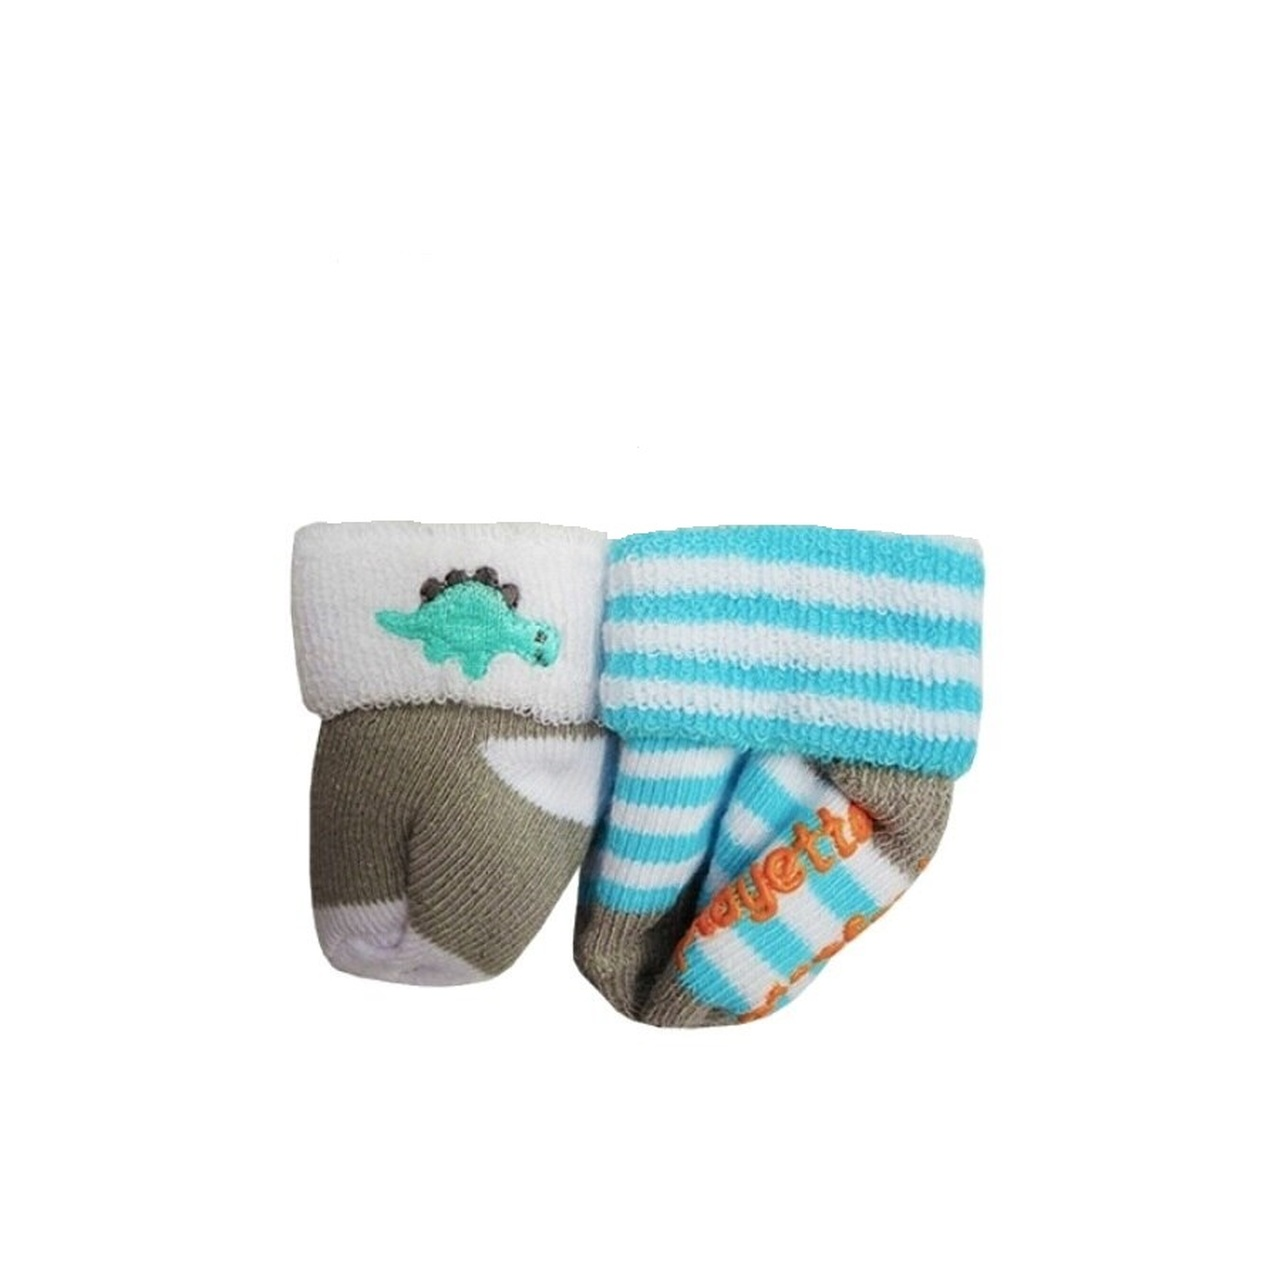 Playette Newborn Bootie Socks 0-3 Months 2 pk - Blue Dino